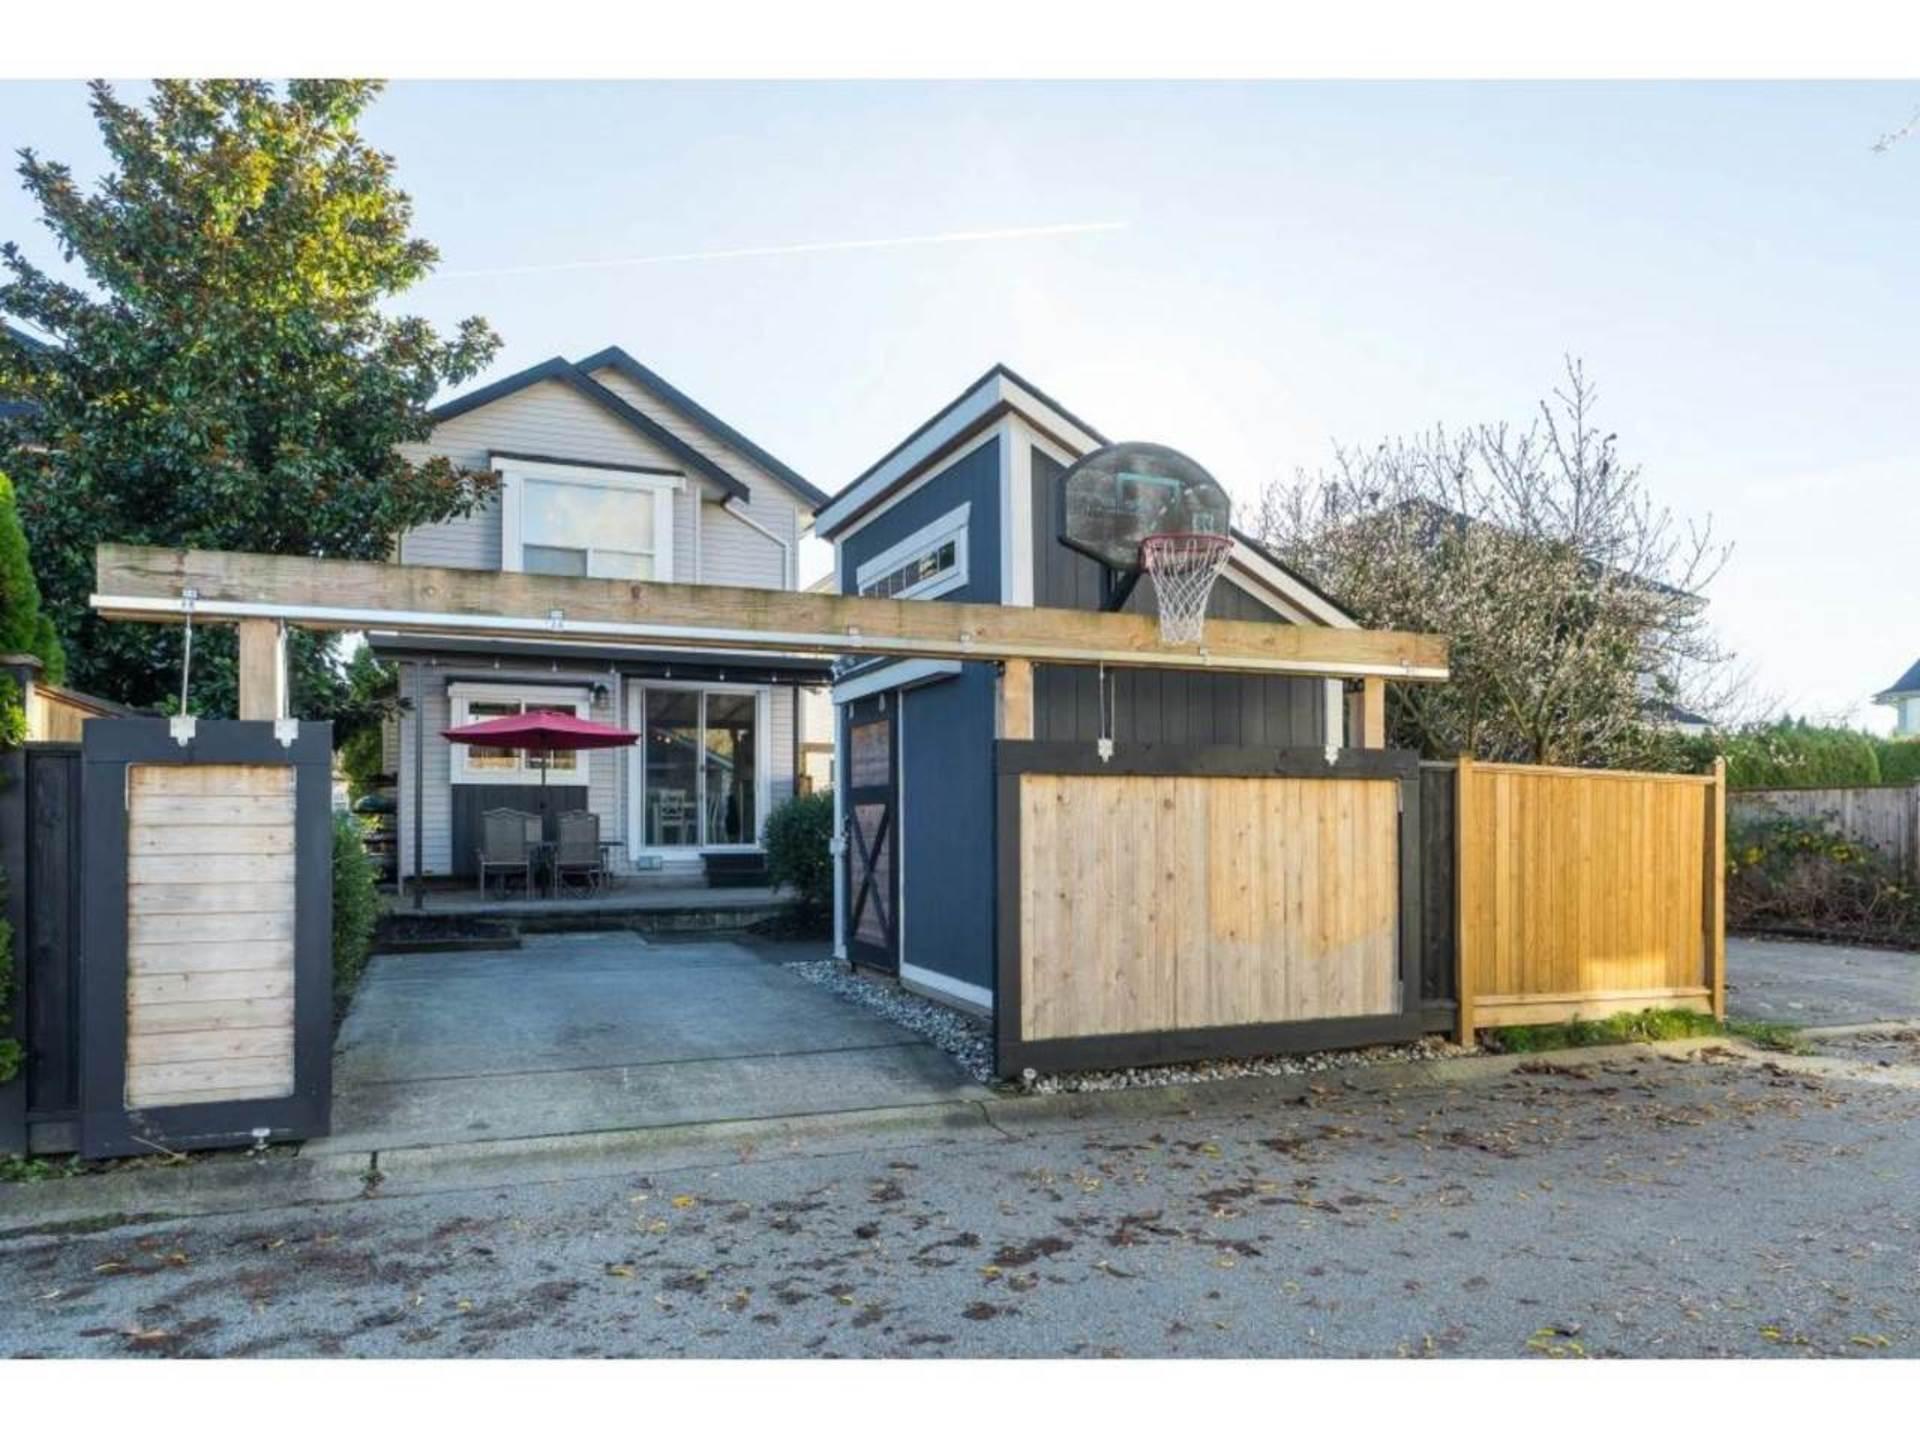 18457-65-avenue-cloverdale-bc-cloverdale-18 at 18457 65 Avenue, Cloverdale BC, Cloverdale